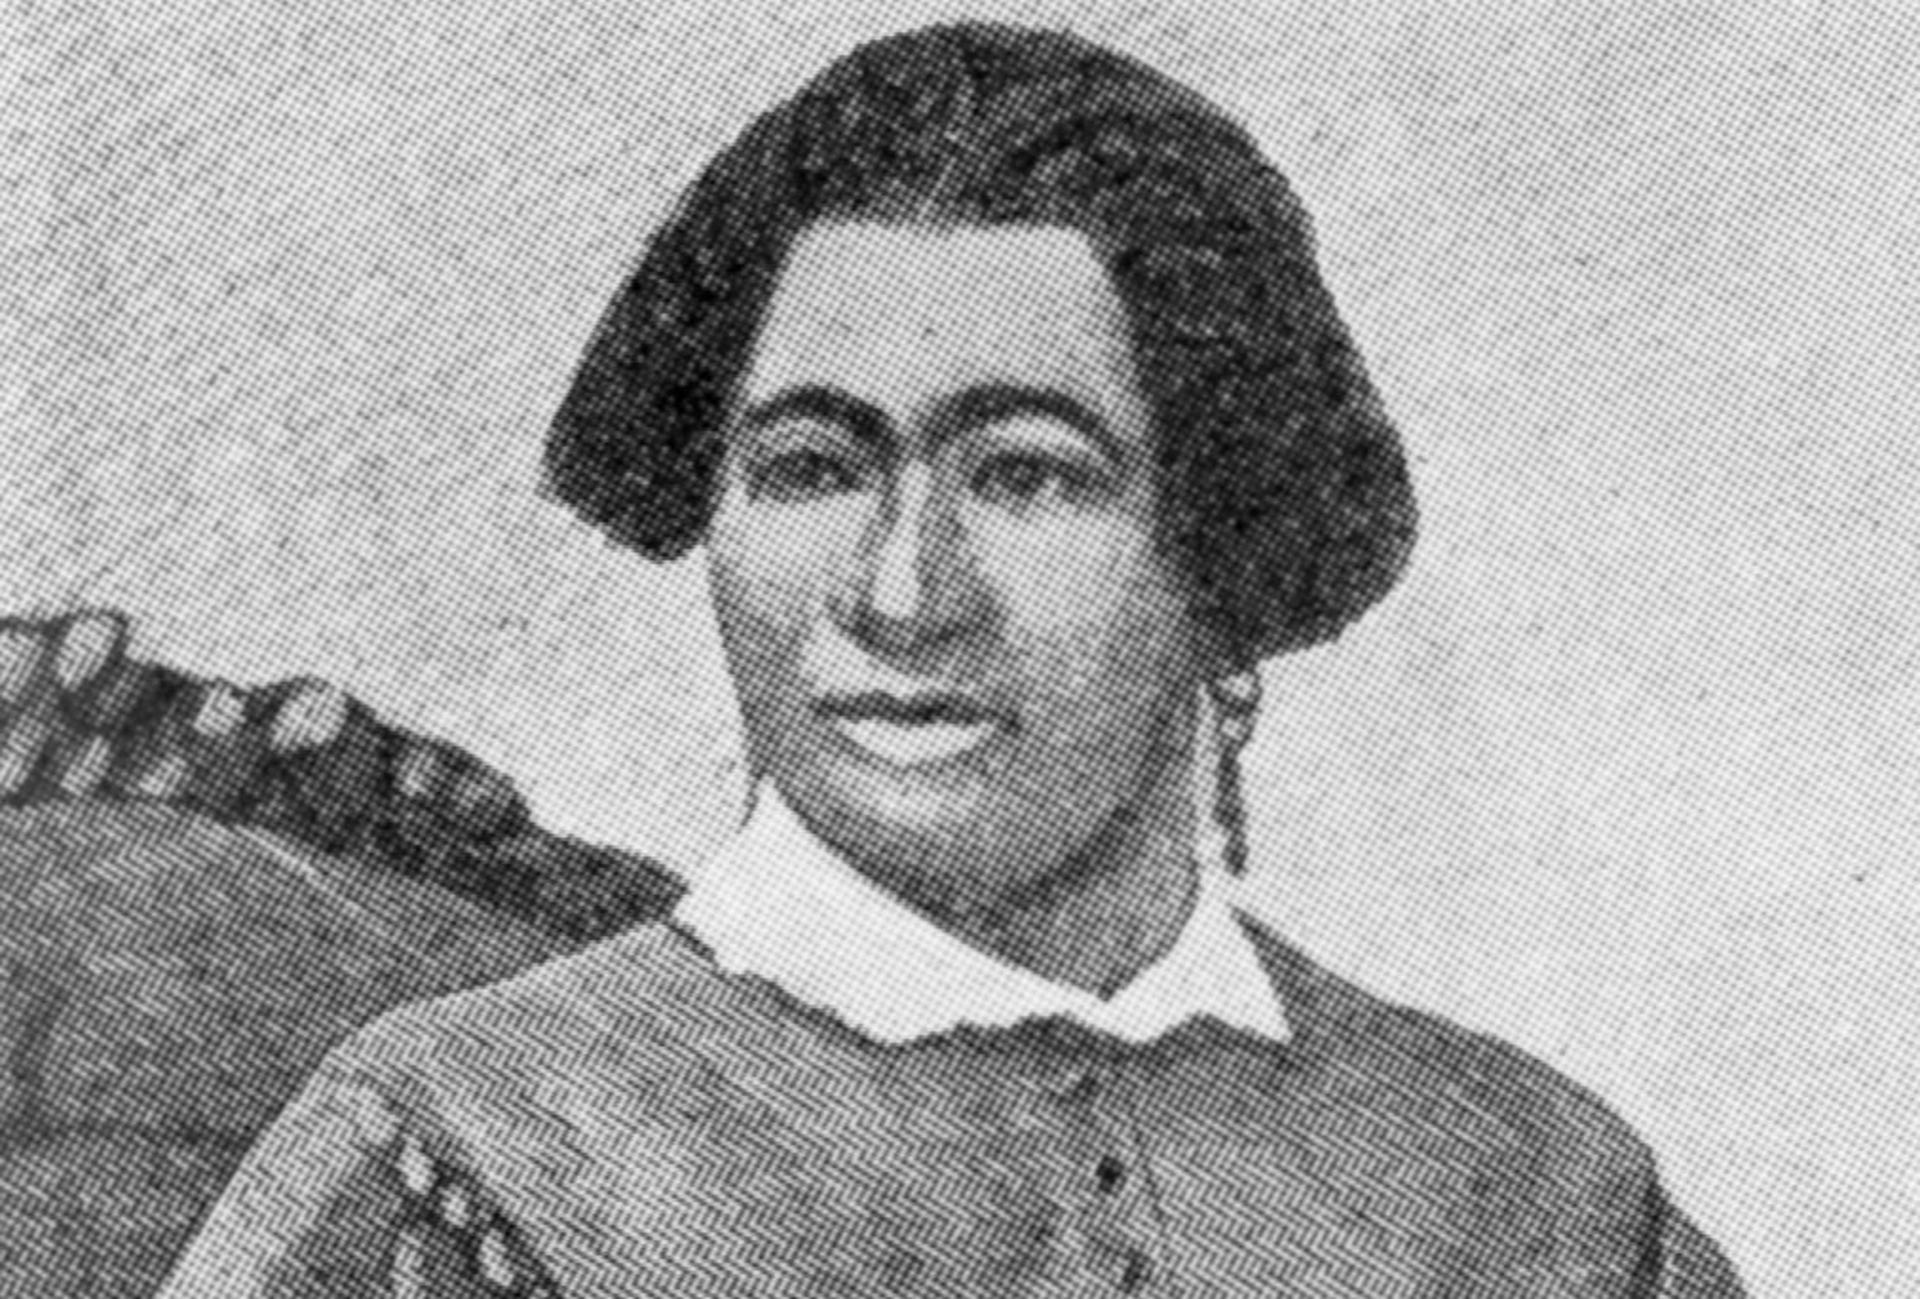 biography of elizabeth taylor greenfield